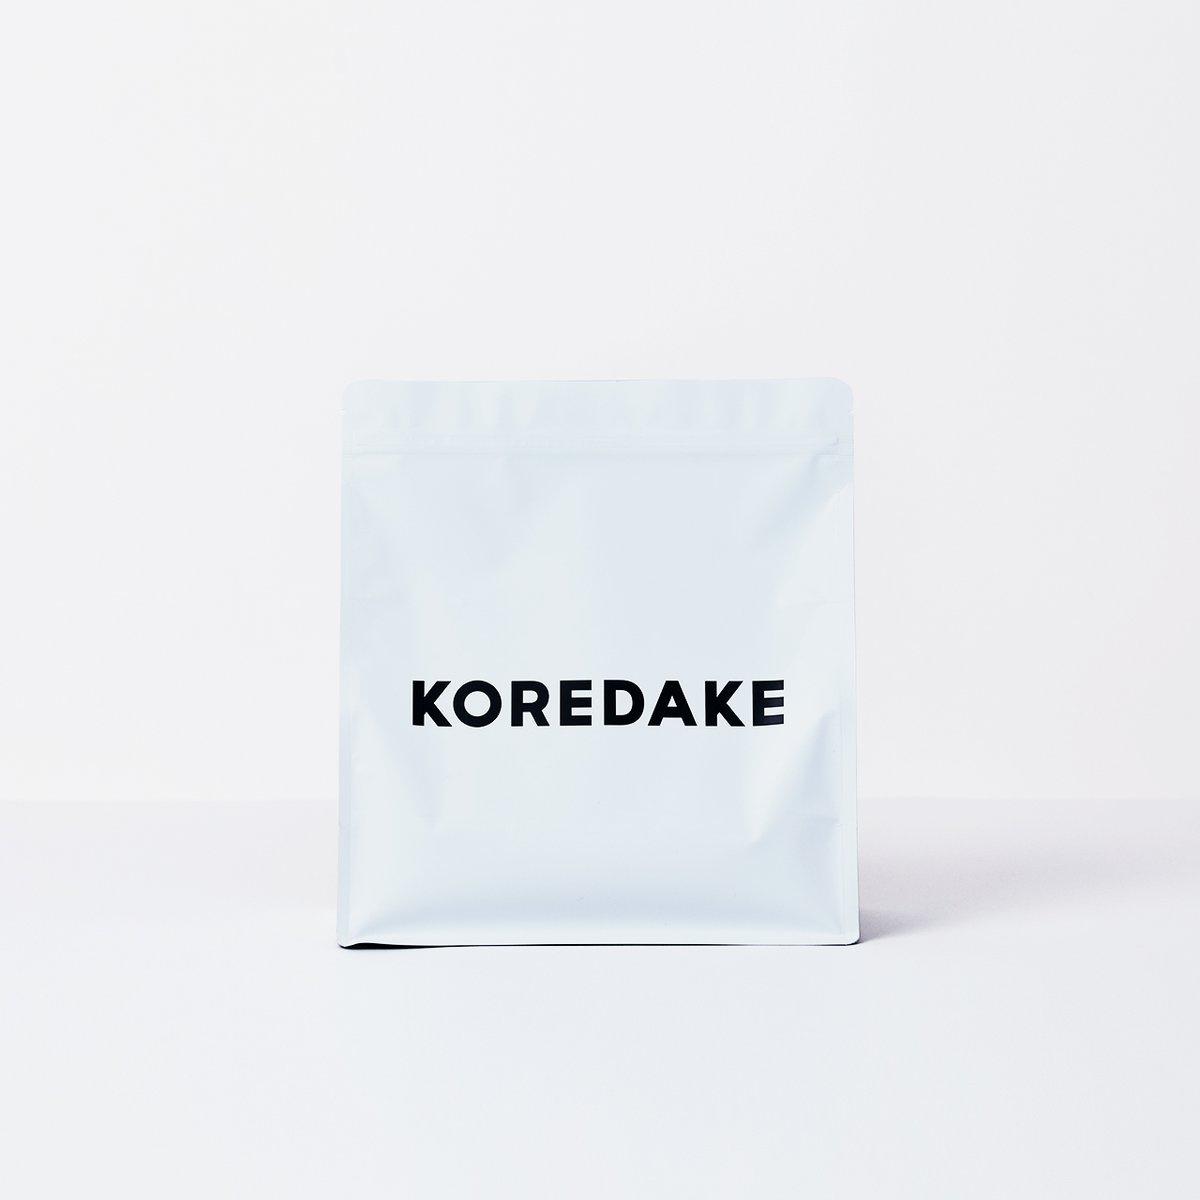 KOREDAKE(コレダケ) 完全栄養プロテインの商品画像